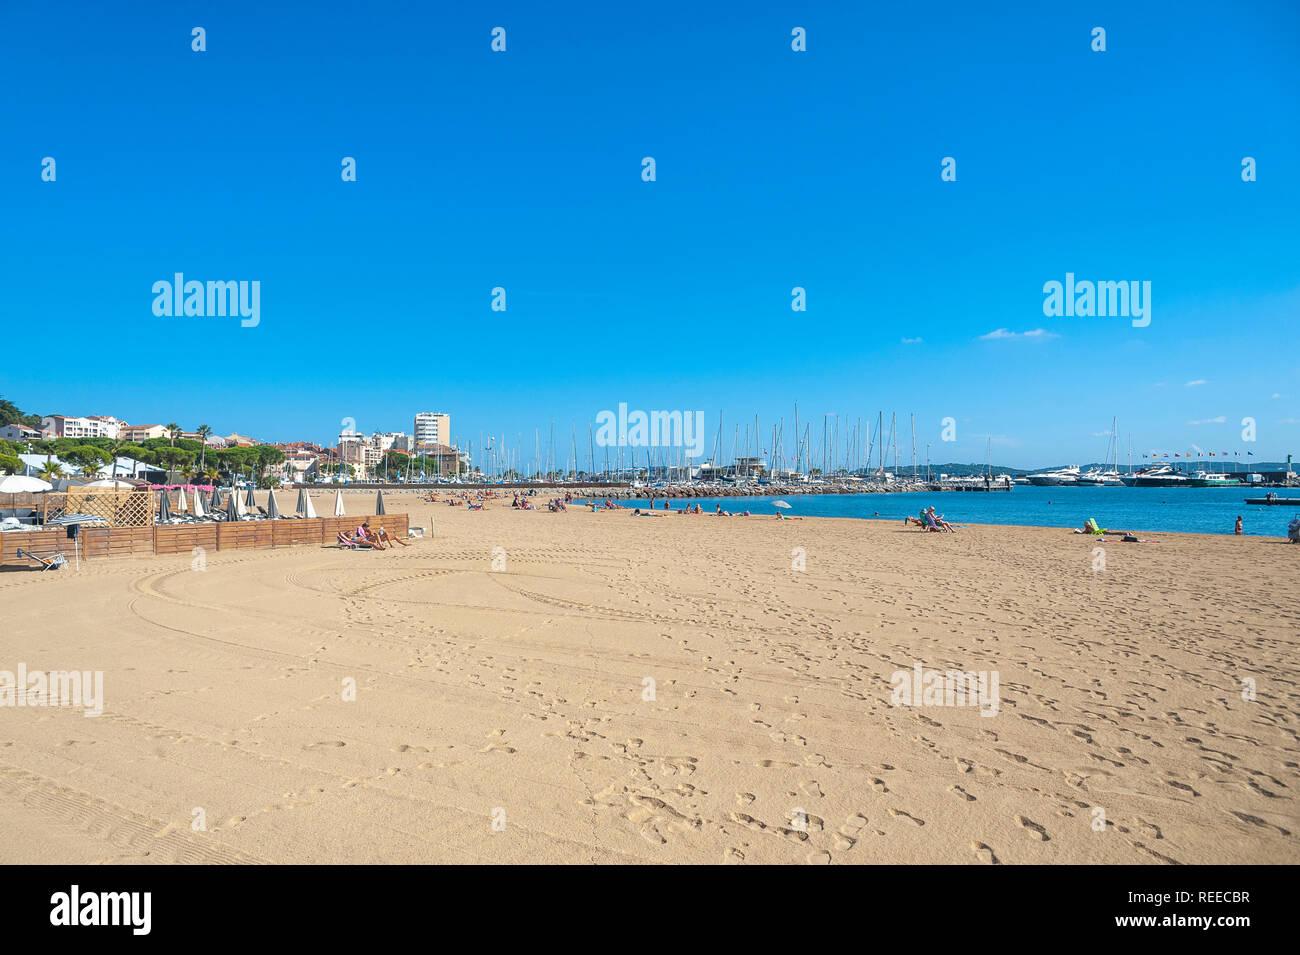 Beach, Sainte-Maxime, Var, Provence-Alpes-Cote d`Azur, France, Europe Stock Photo